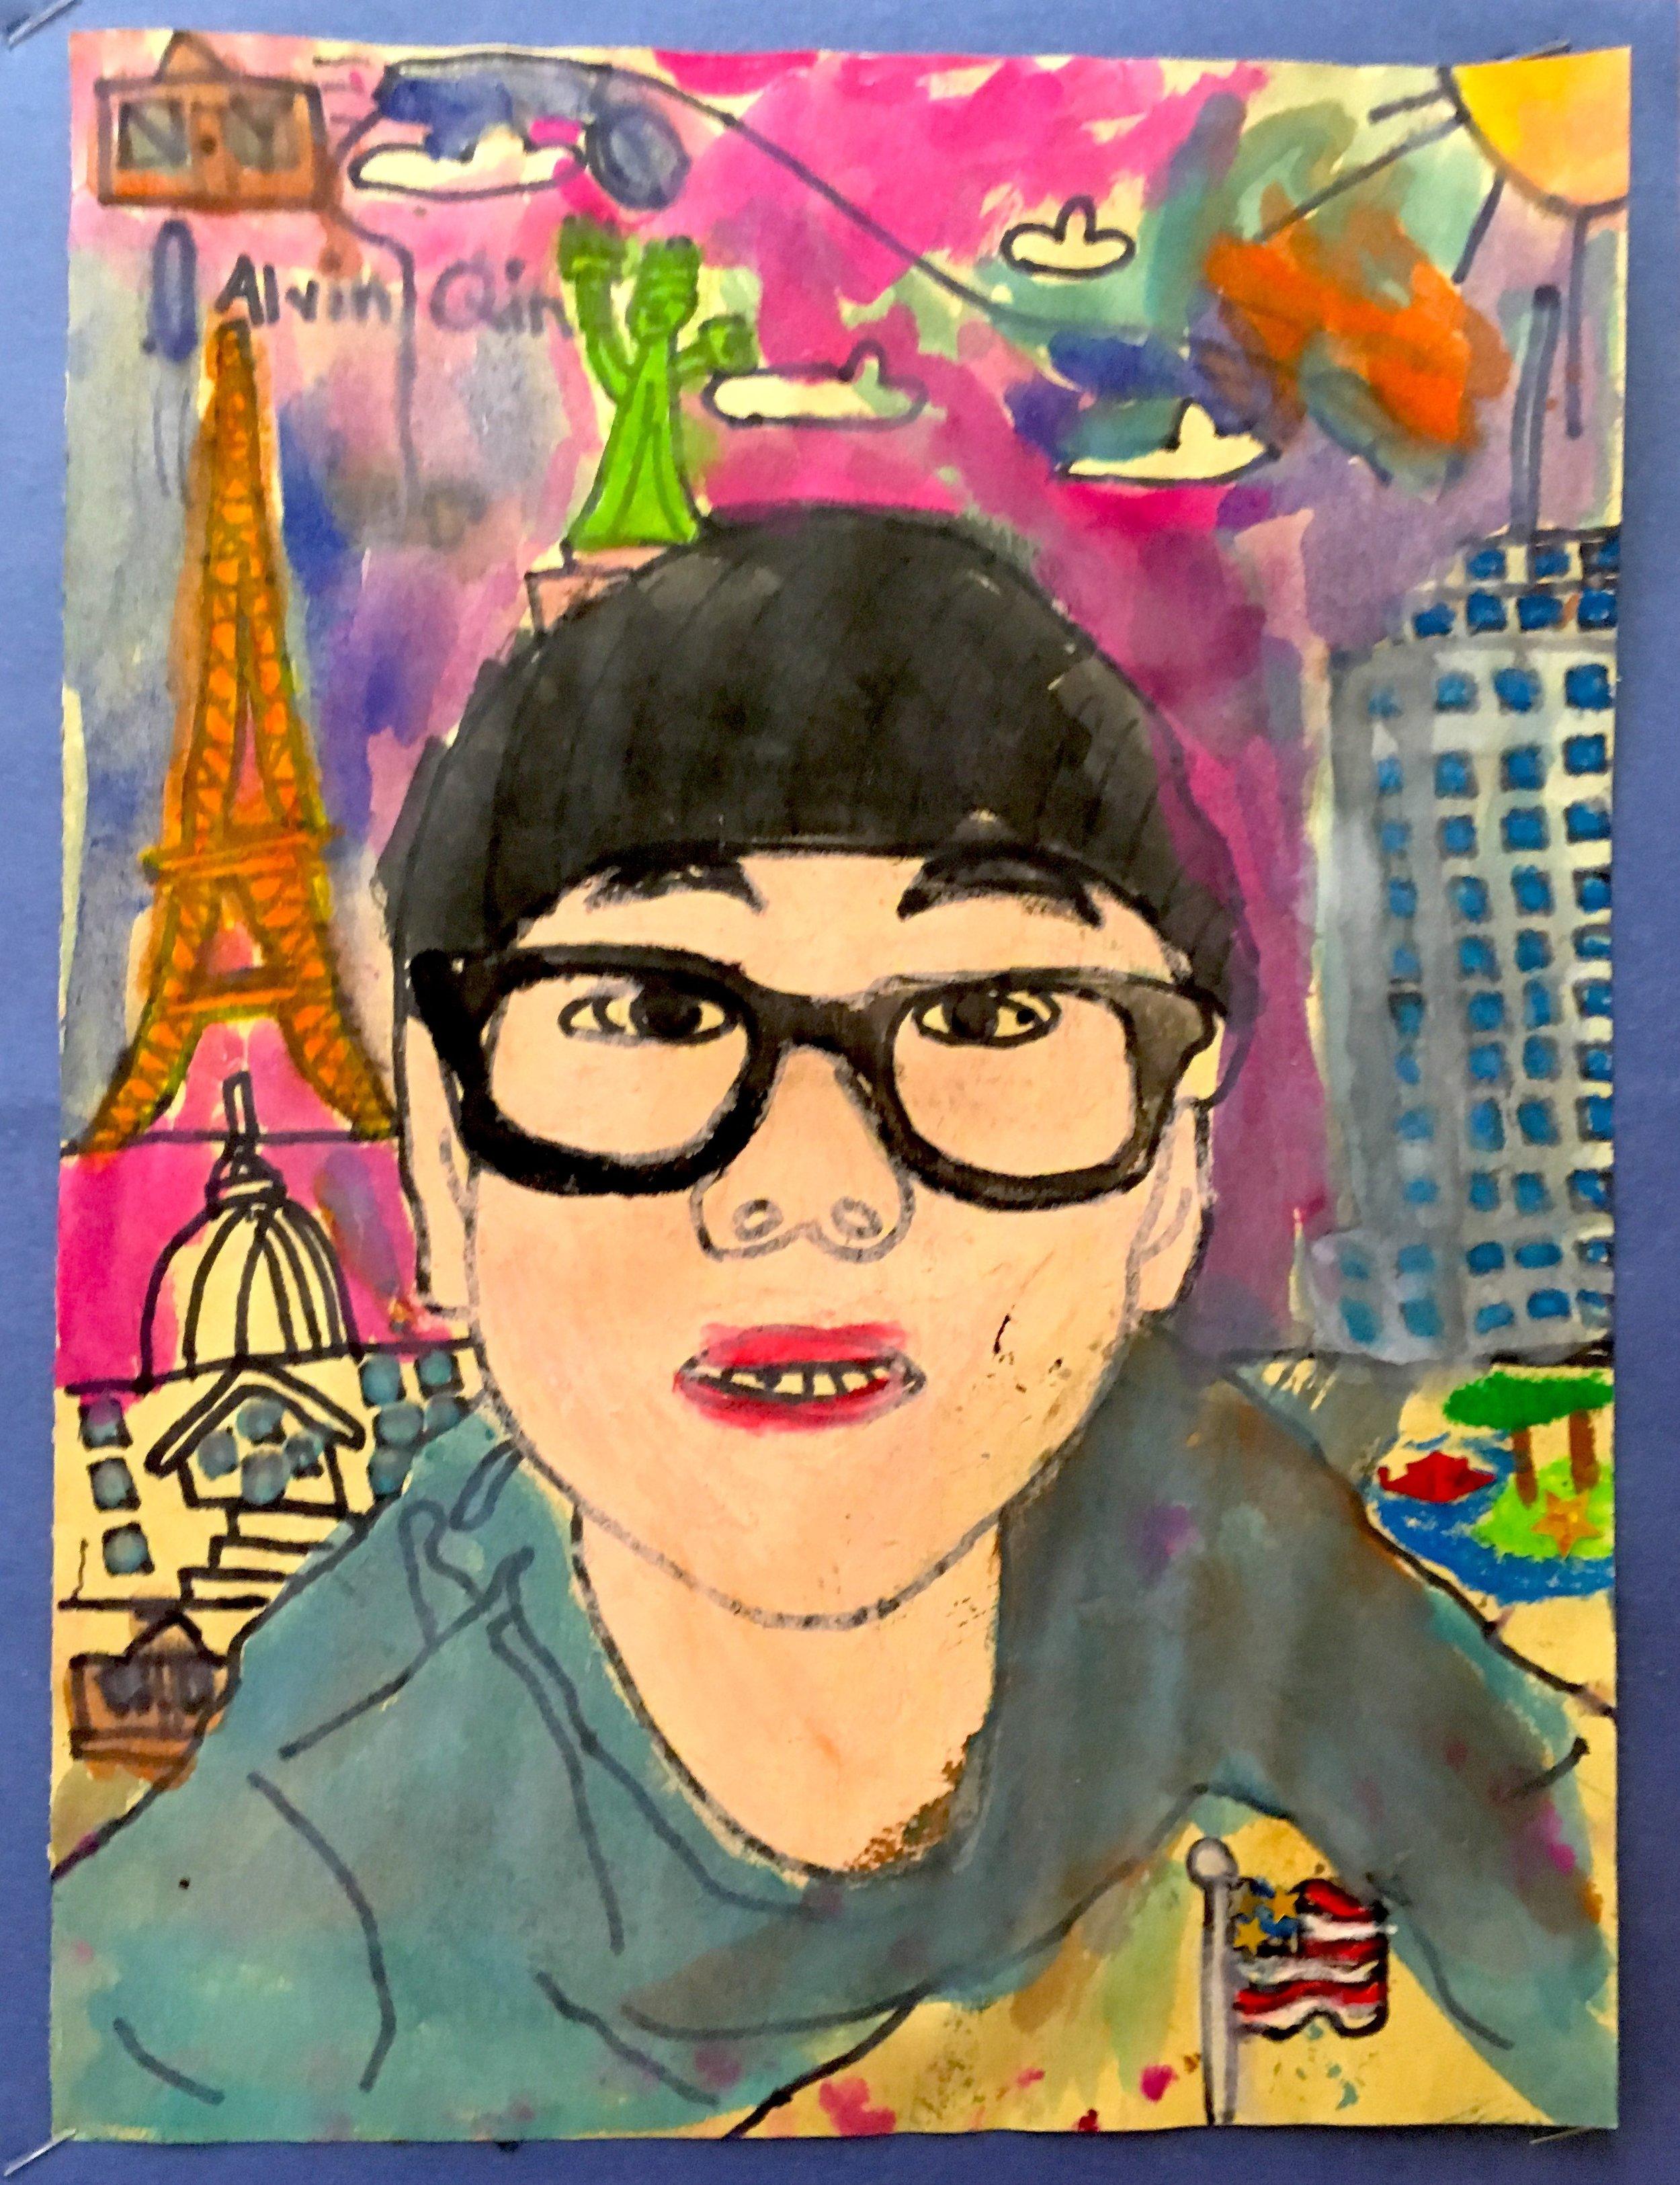 Me, i and Myself, Inspired by Frida Kahlo,  Alvin Qin (2nd grade), 2017